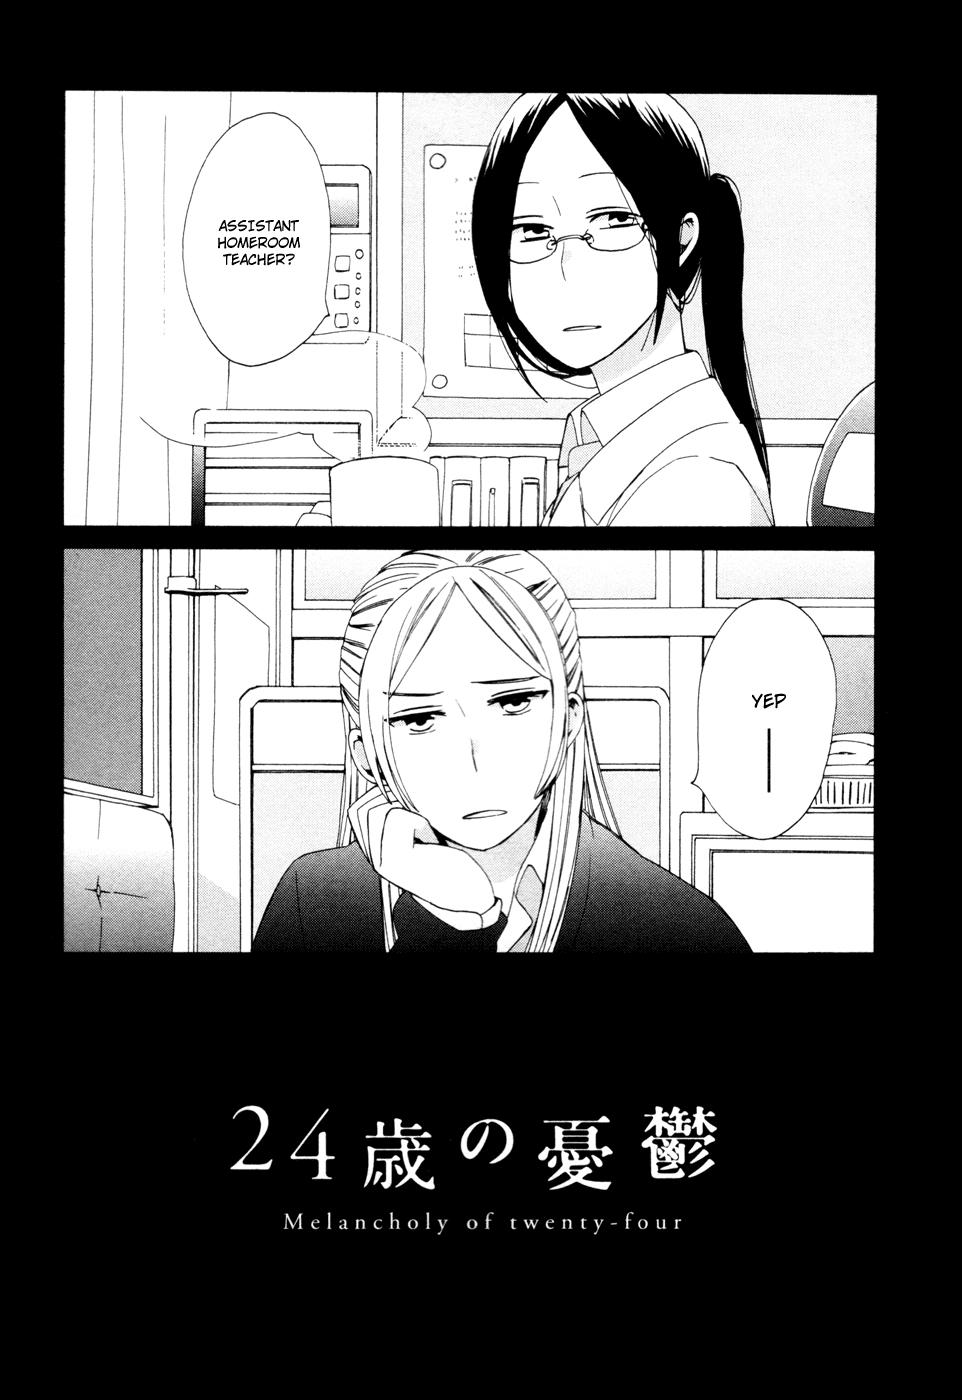 14-sai no Koi - Melancholy of 024 - 1